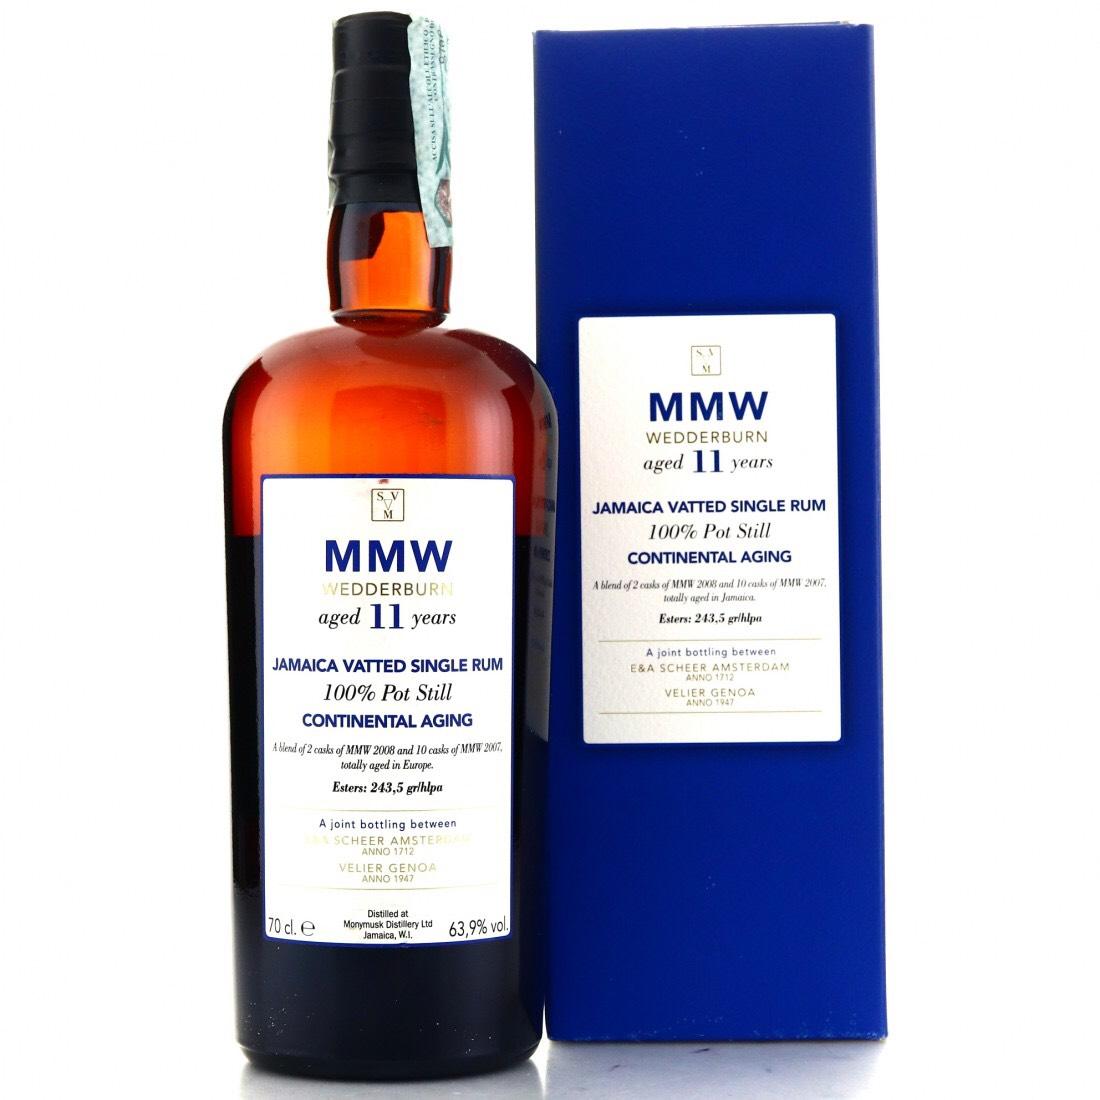 Bottle image of Wedderburn Continental Aging MMW